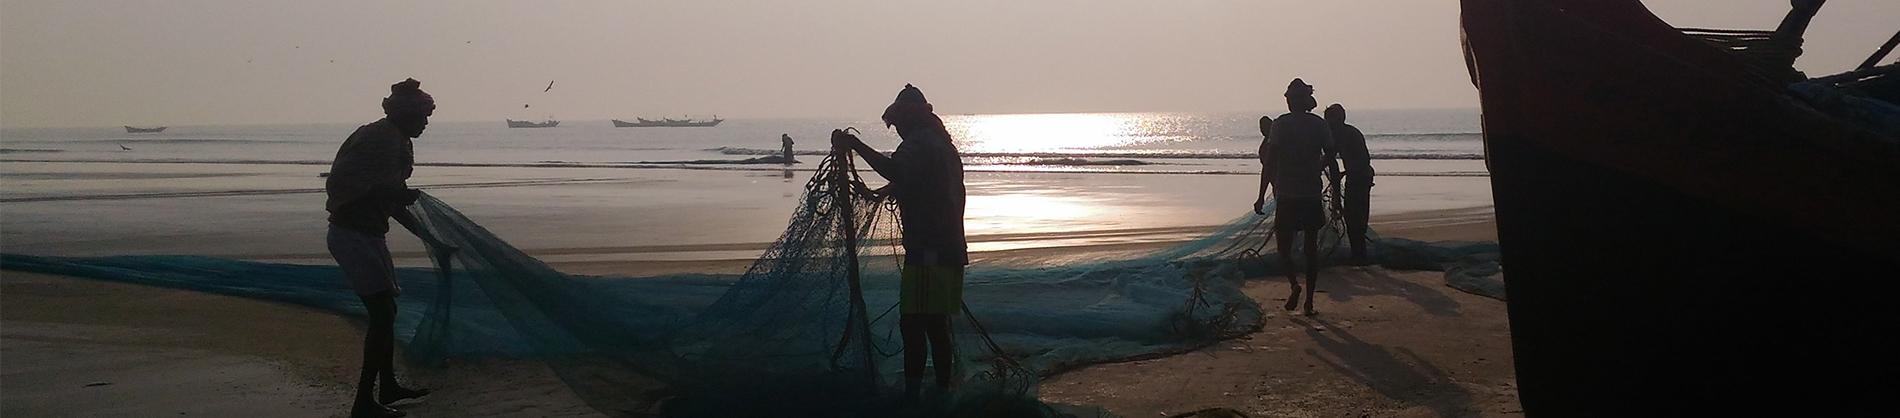 Fishermen putting out nets